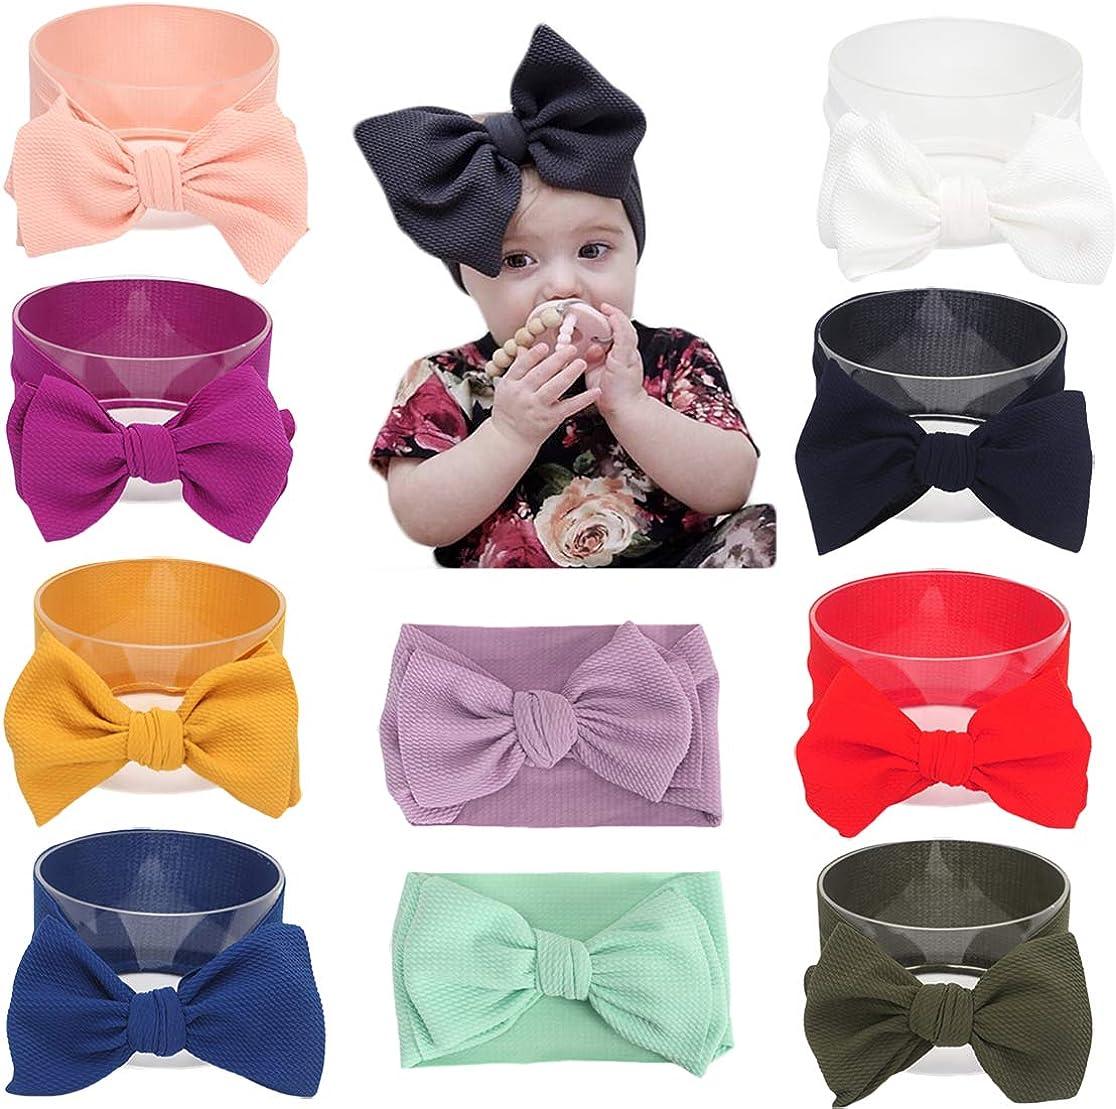 Baby Girl Diy Elastic Headbands Newborn Infant Toddler Big Bows Hairbands Children Soft Headwrap Hair Accessories